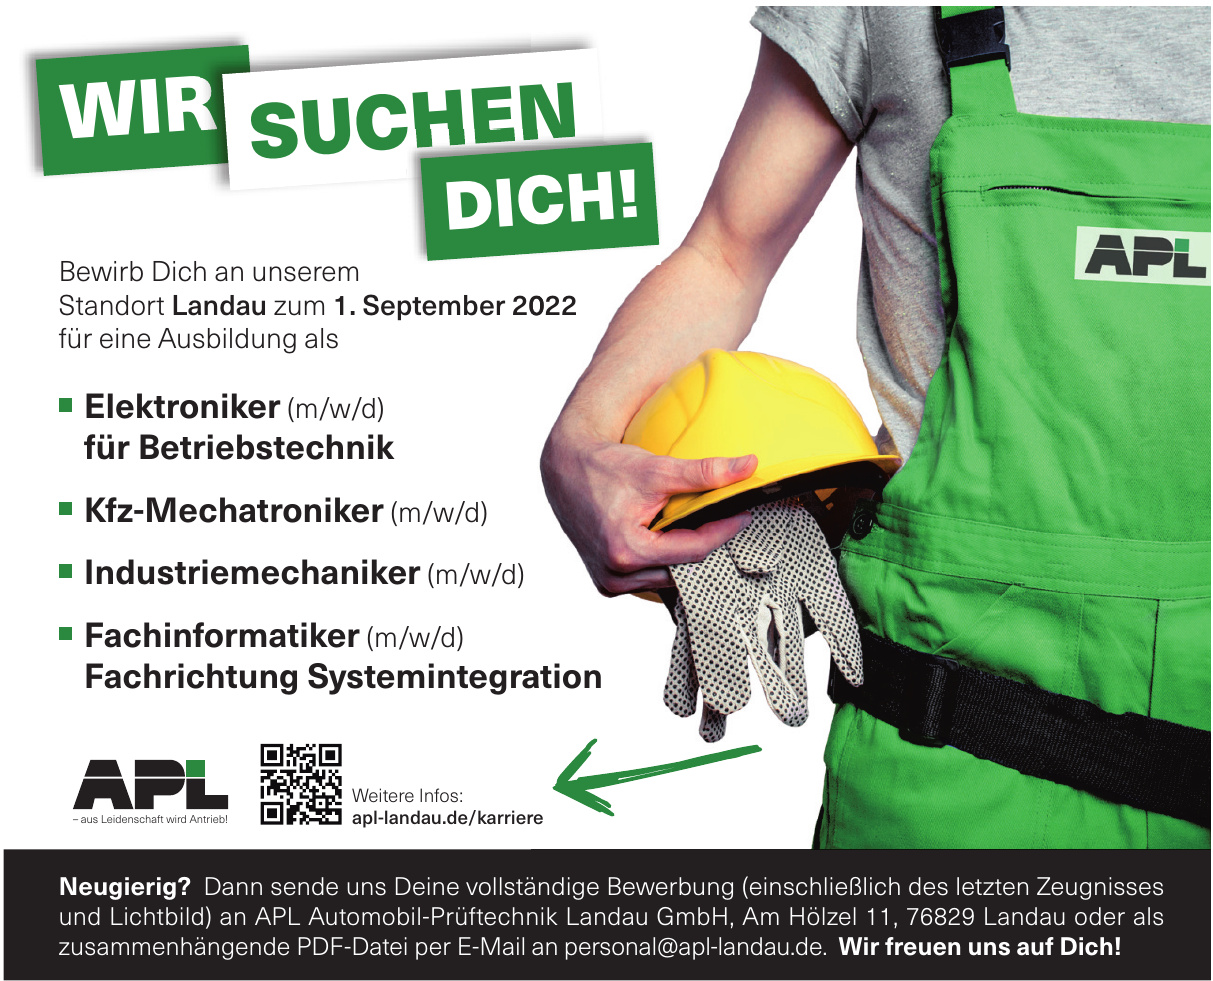 APL Automobil-Prüftechnik Landau GmbH